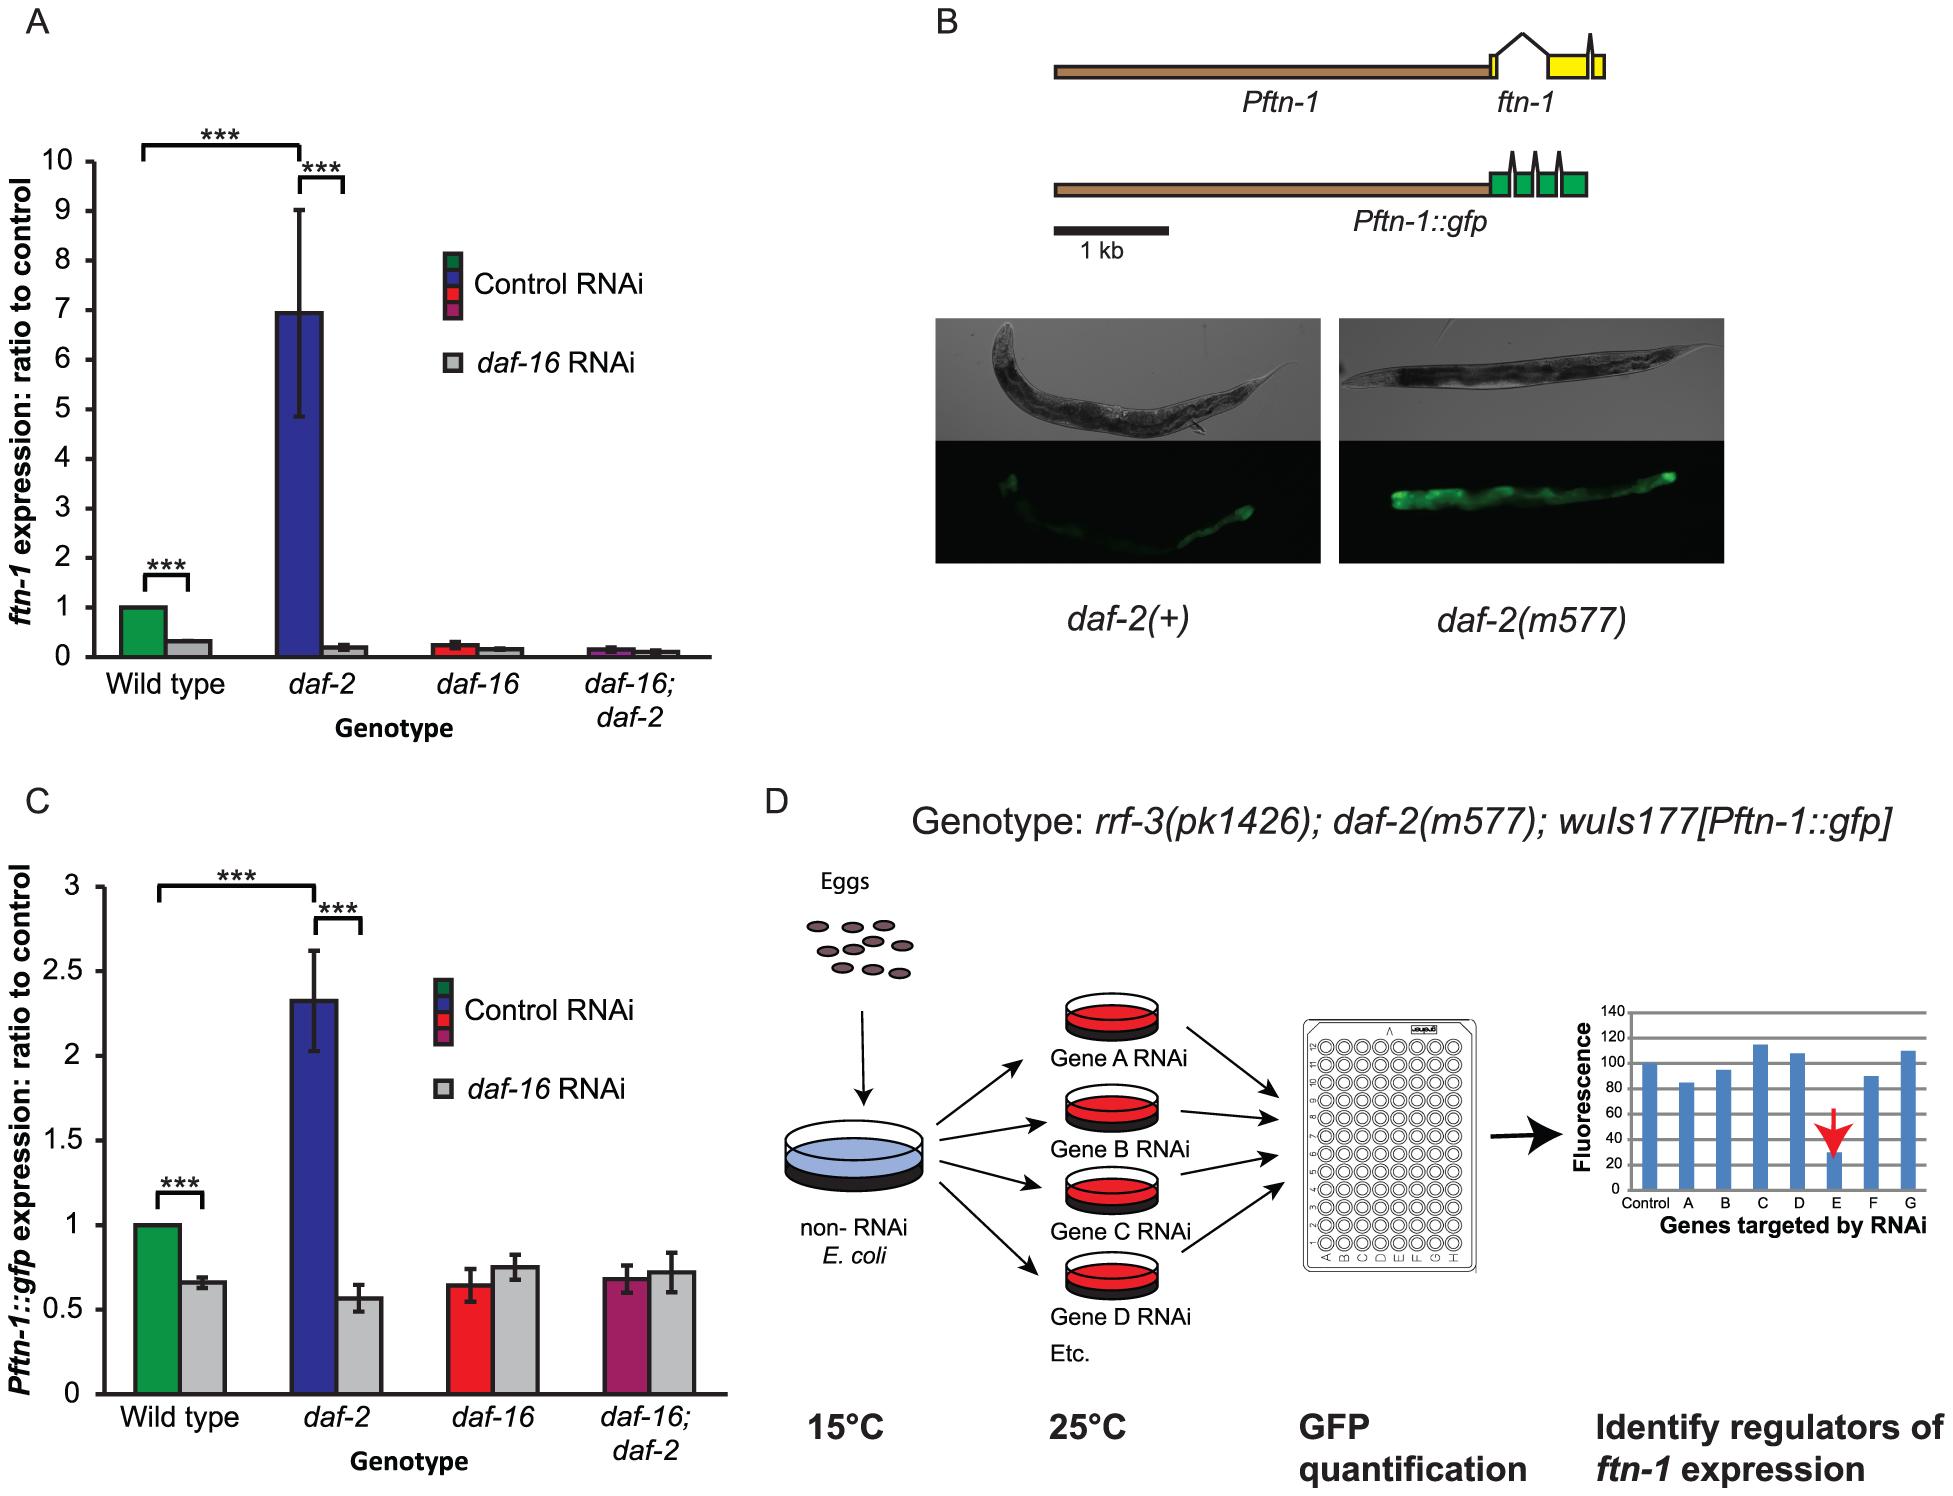 Regulation of the ferritin gene <i>ftn-1</i> by insulin/IGF-1 signaling.